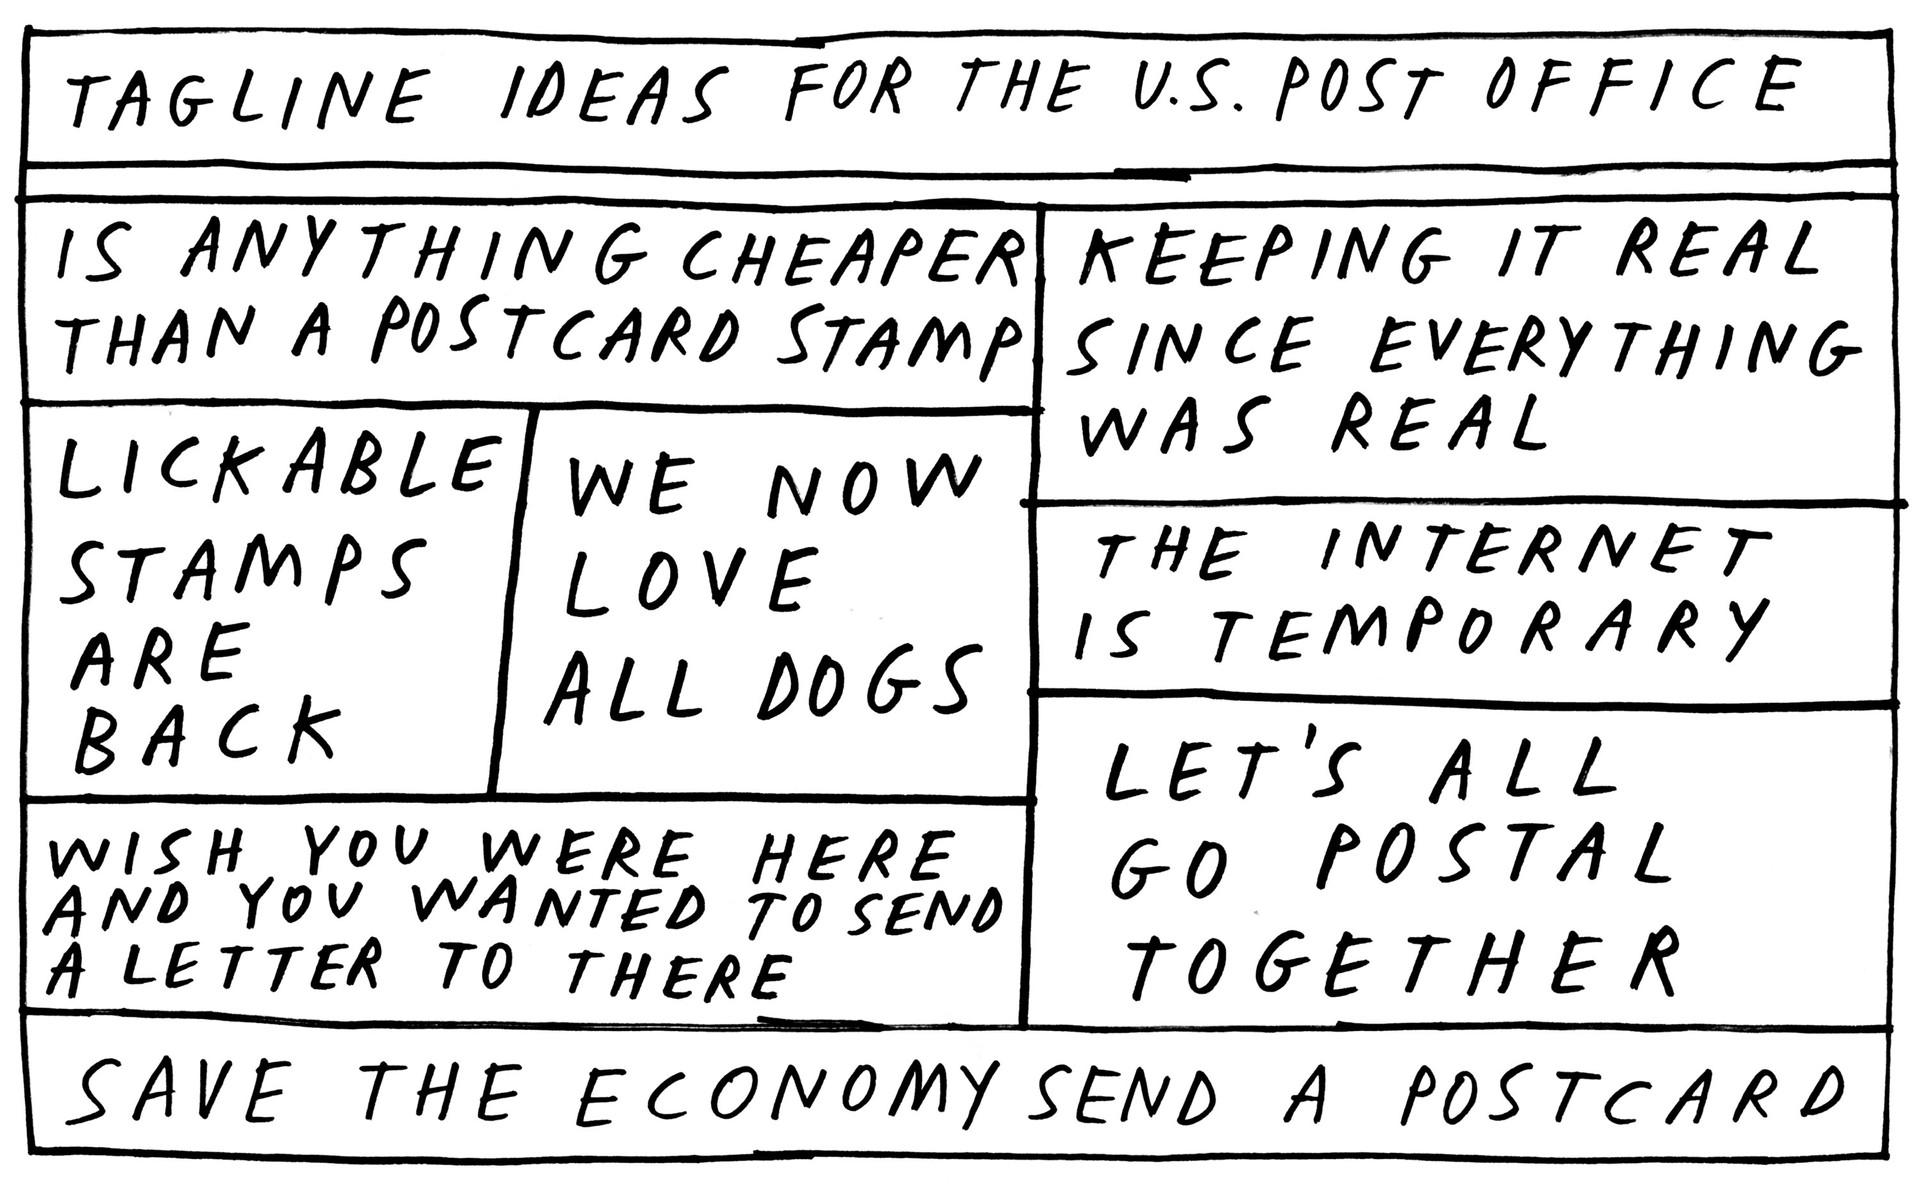 Post Office Taglines